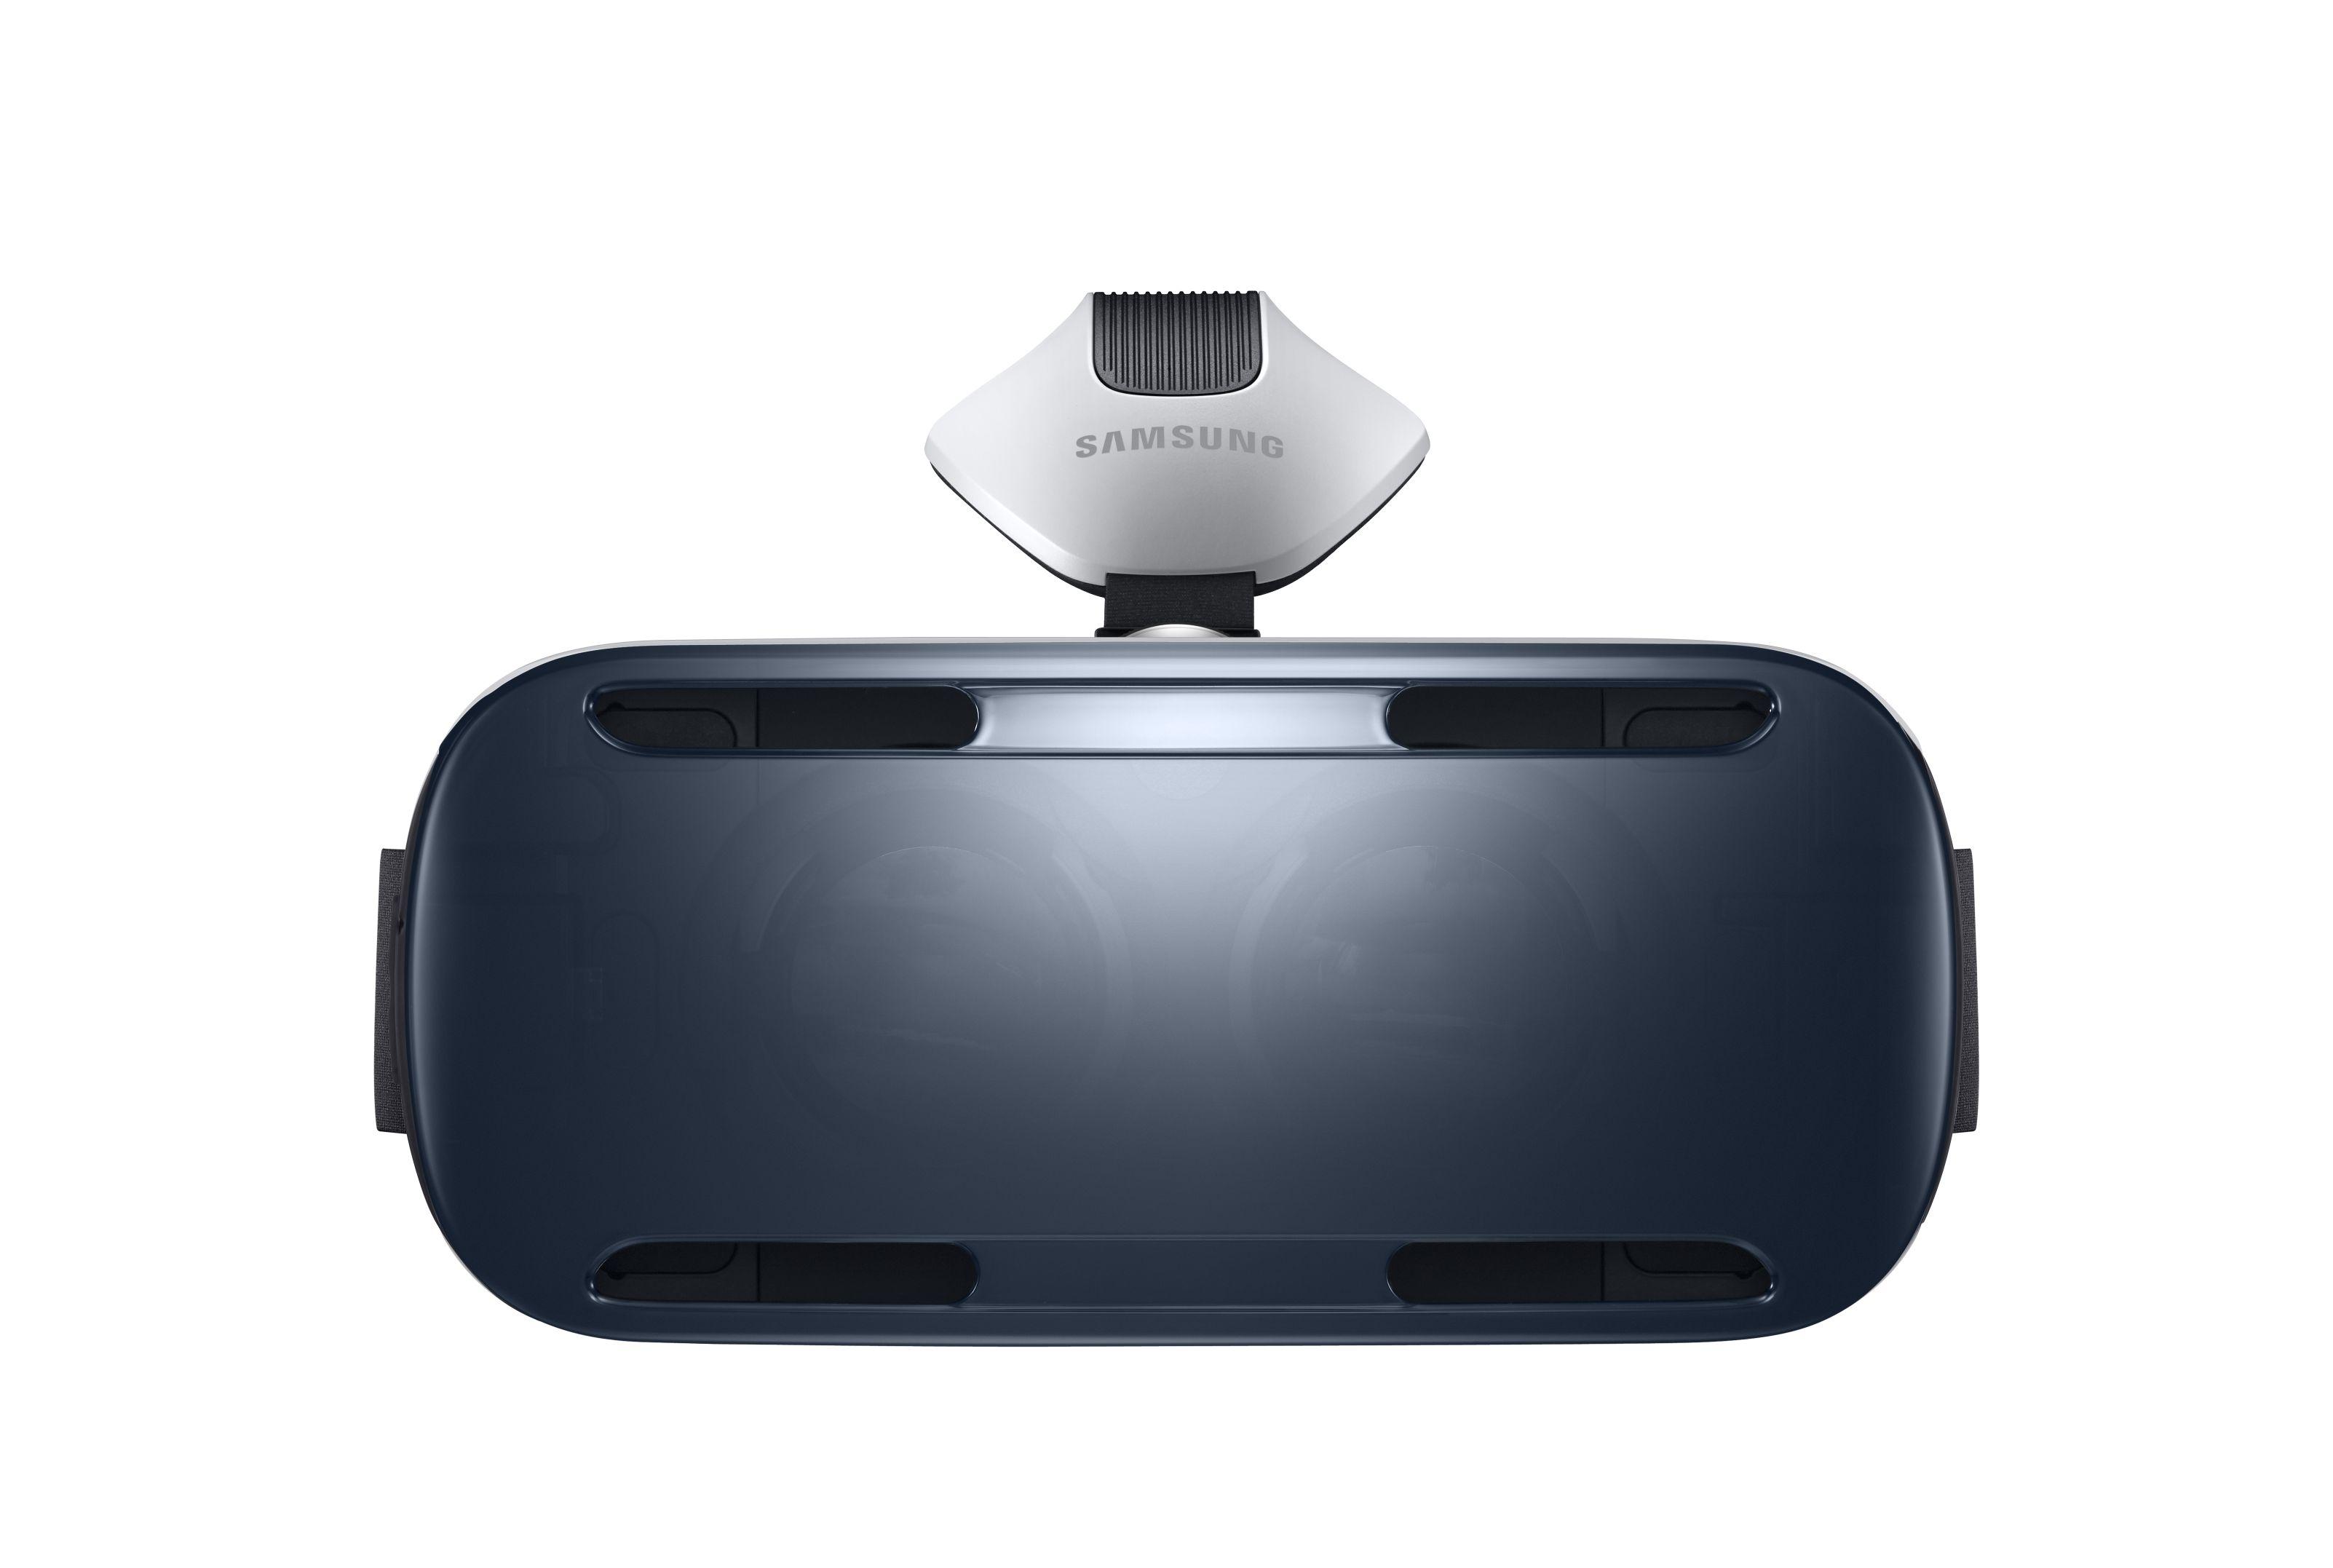 samsung_gear_VR_szemuveg_IFA2014_3